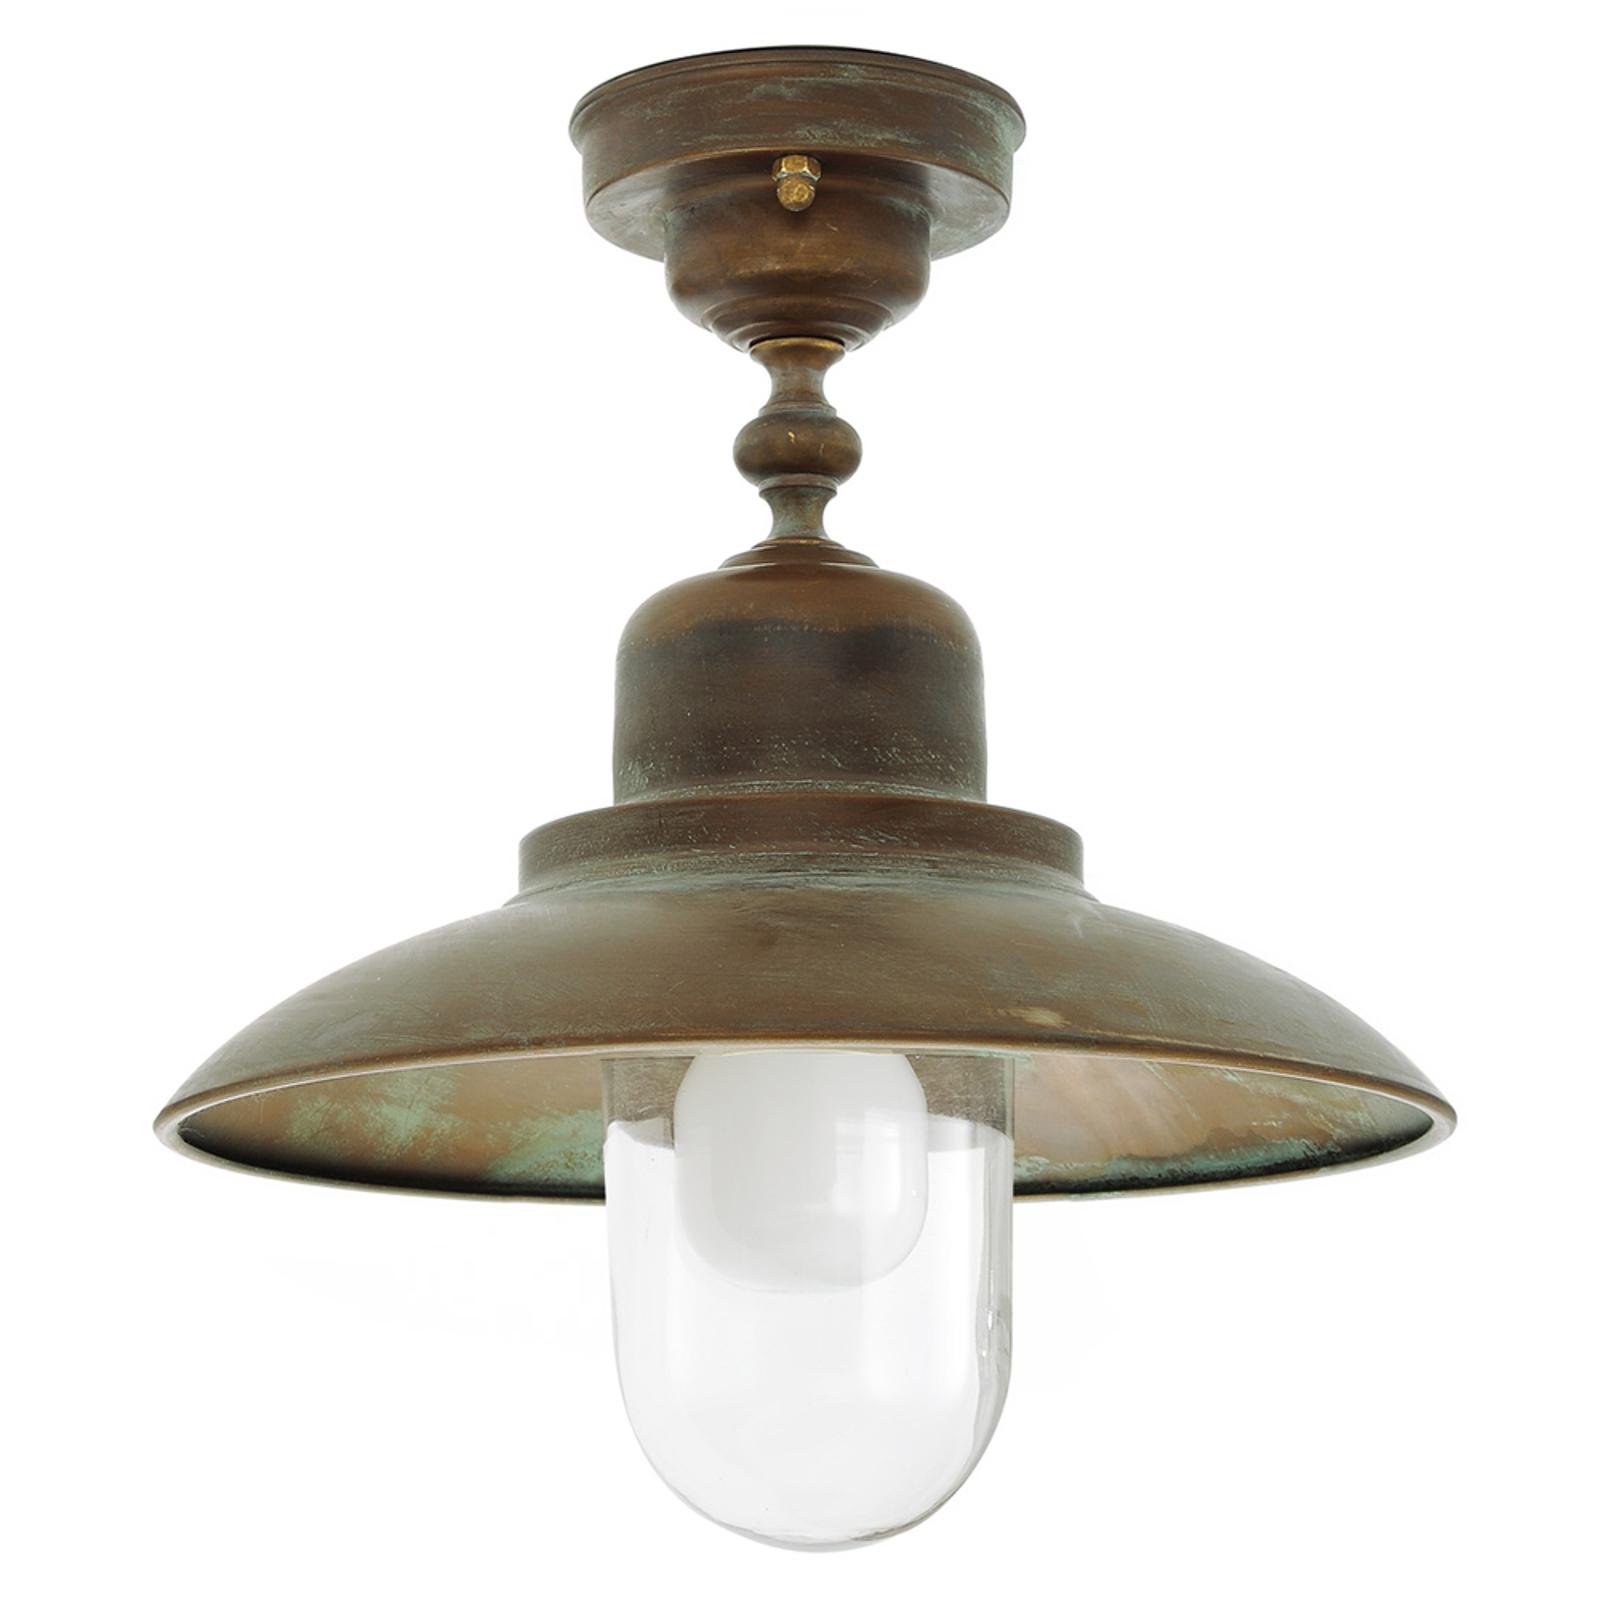 Wartościowa mosiężna lampa sufitowa Turino - IP44